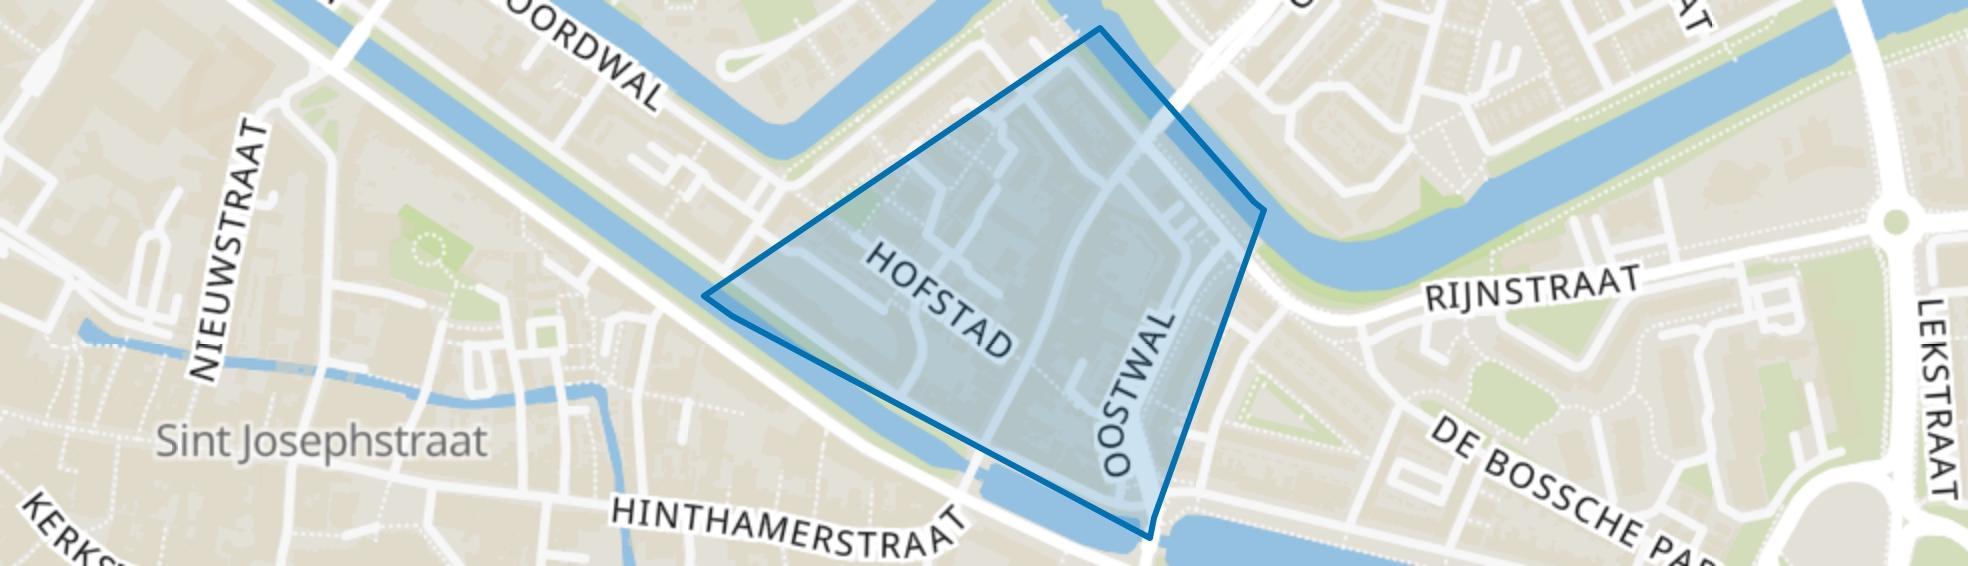 De Hofstad, Den Bosch map